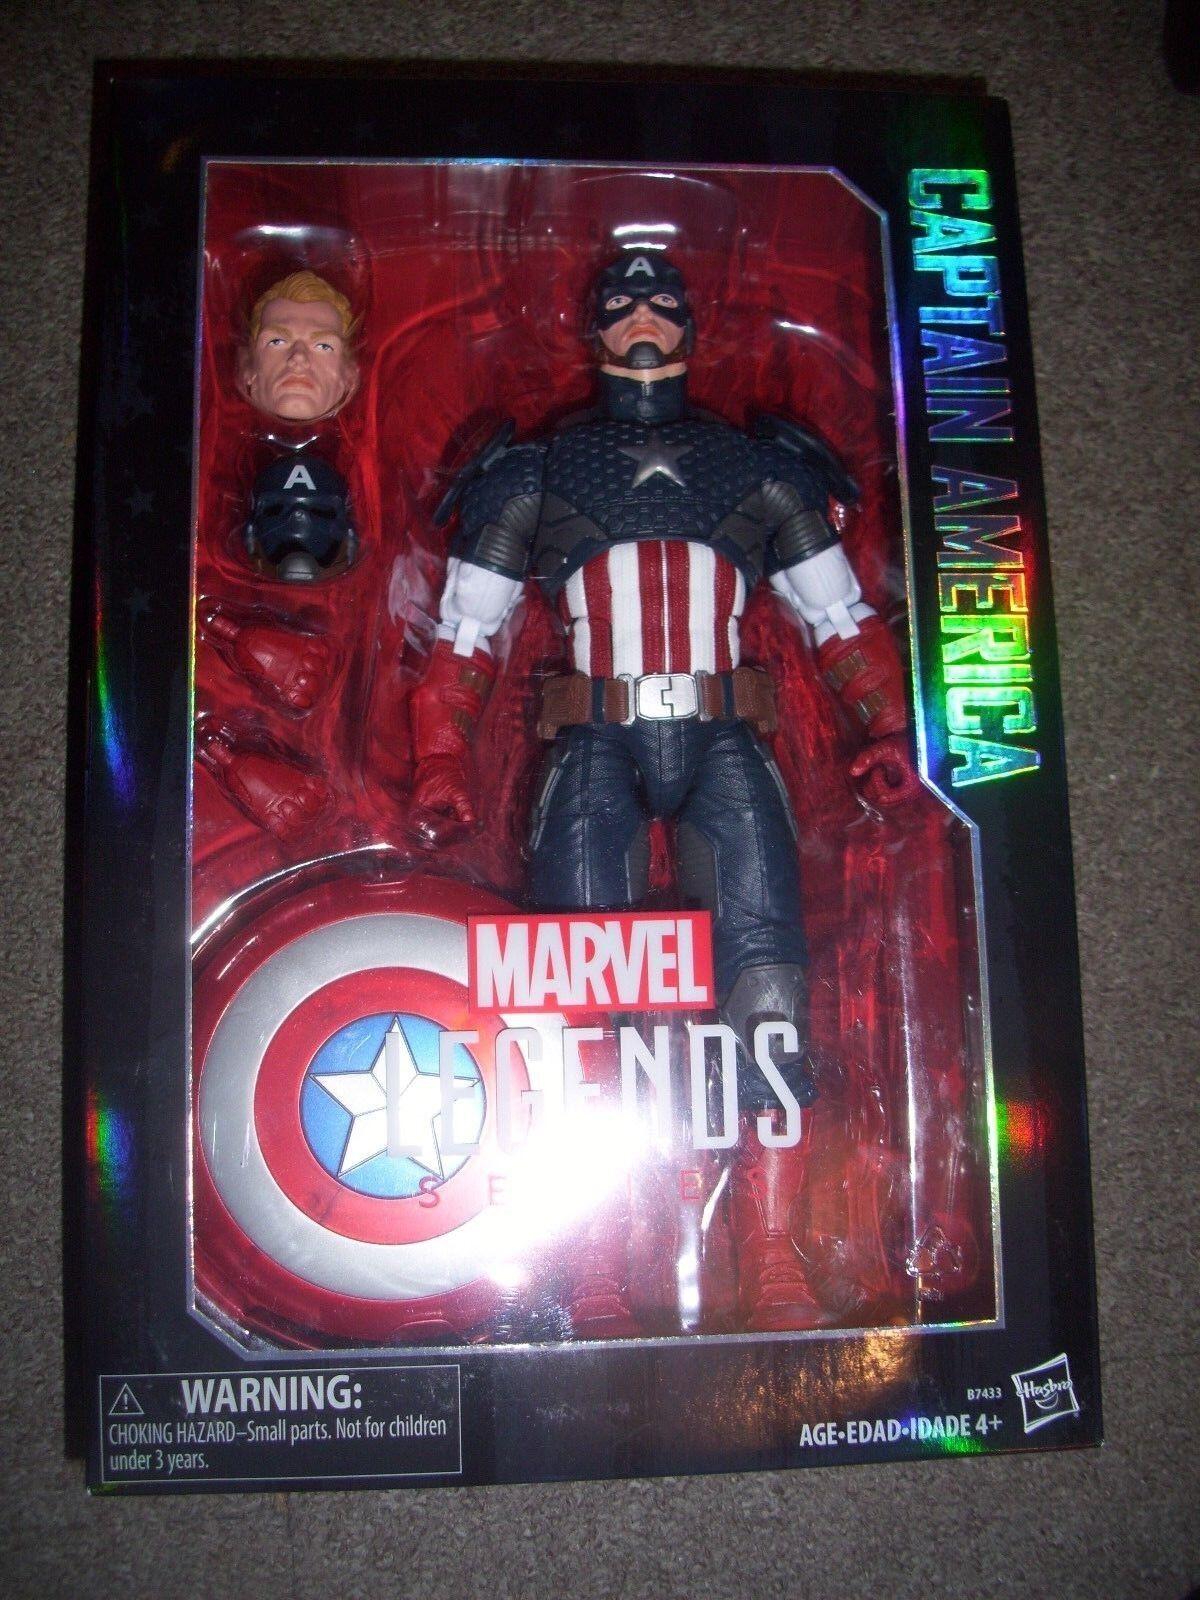 Marvel The Avengers Legends Series Captain America 12-Inch figure. still sealed